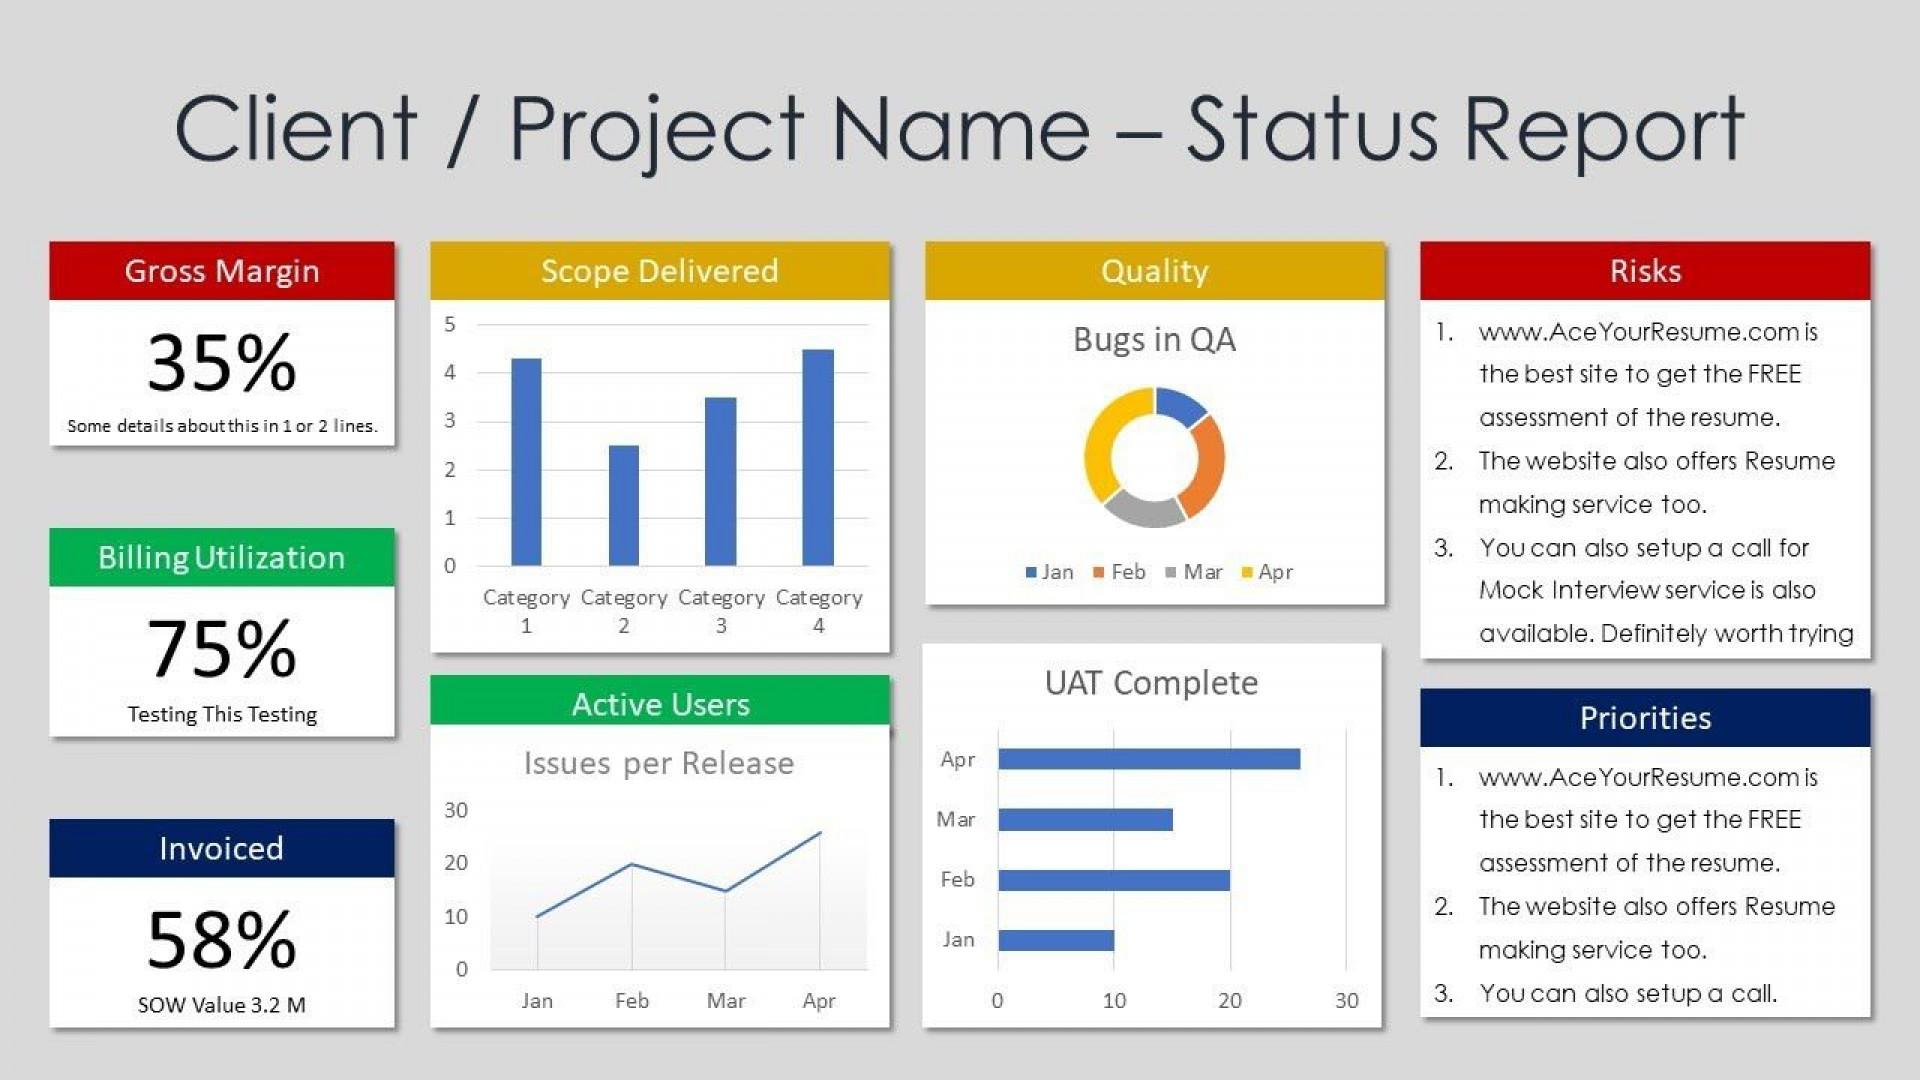 001 Wonderful Project Management Statu Report Example Concept  Template Word Agile Progres1920